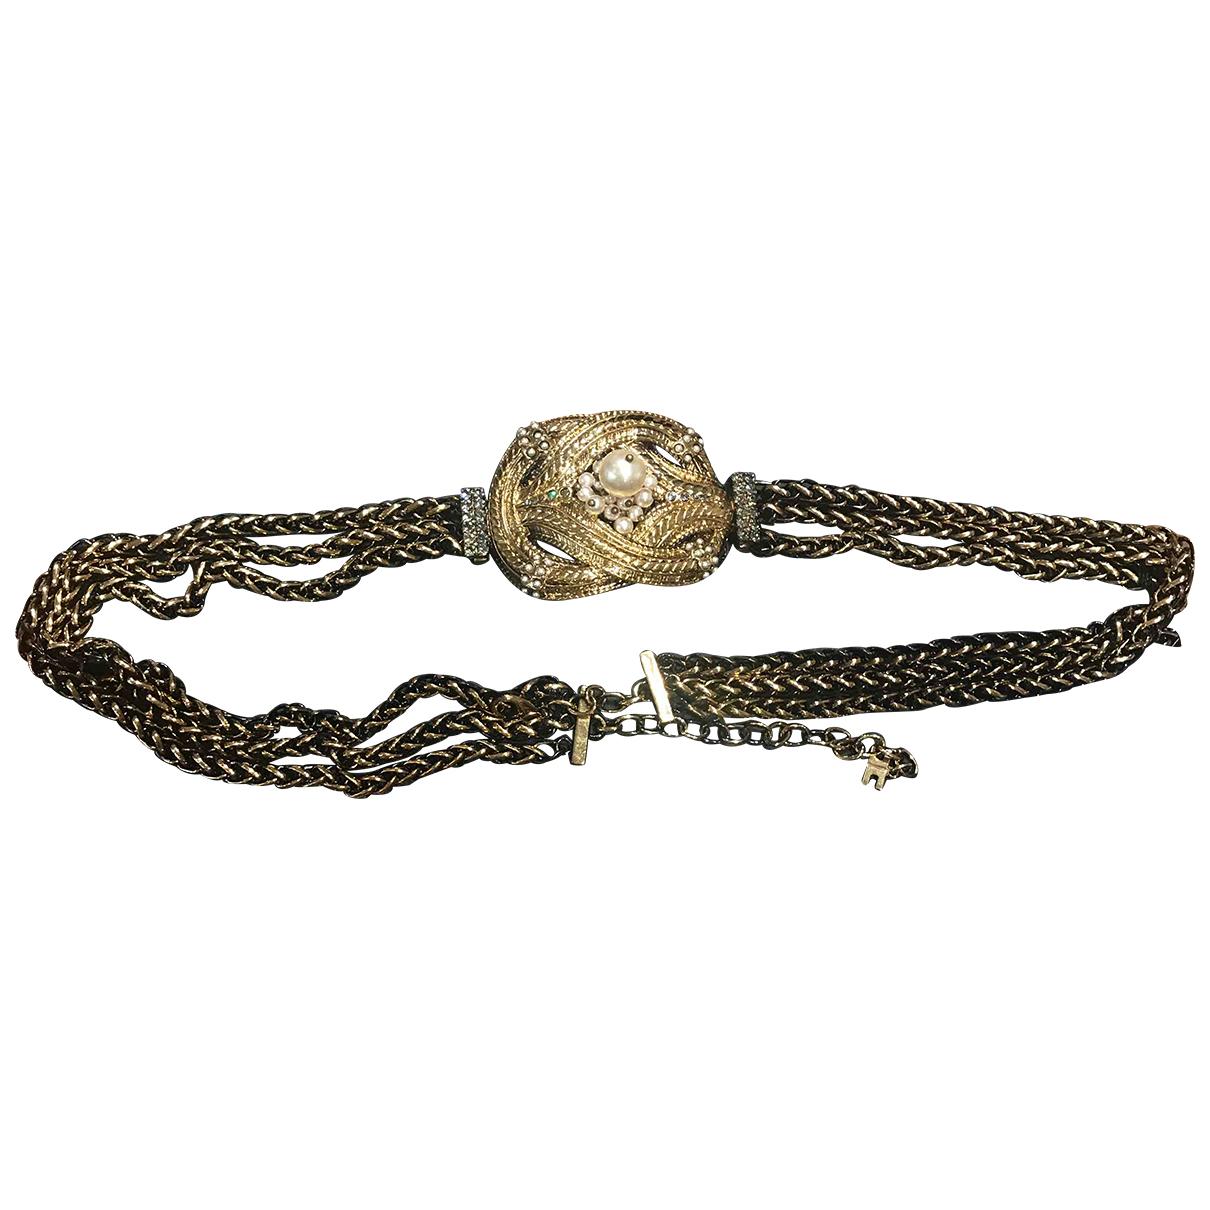 Elisabetta Franchi \N Gold Chain belt for Women S International